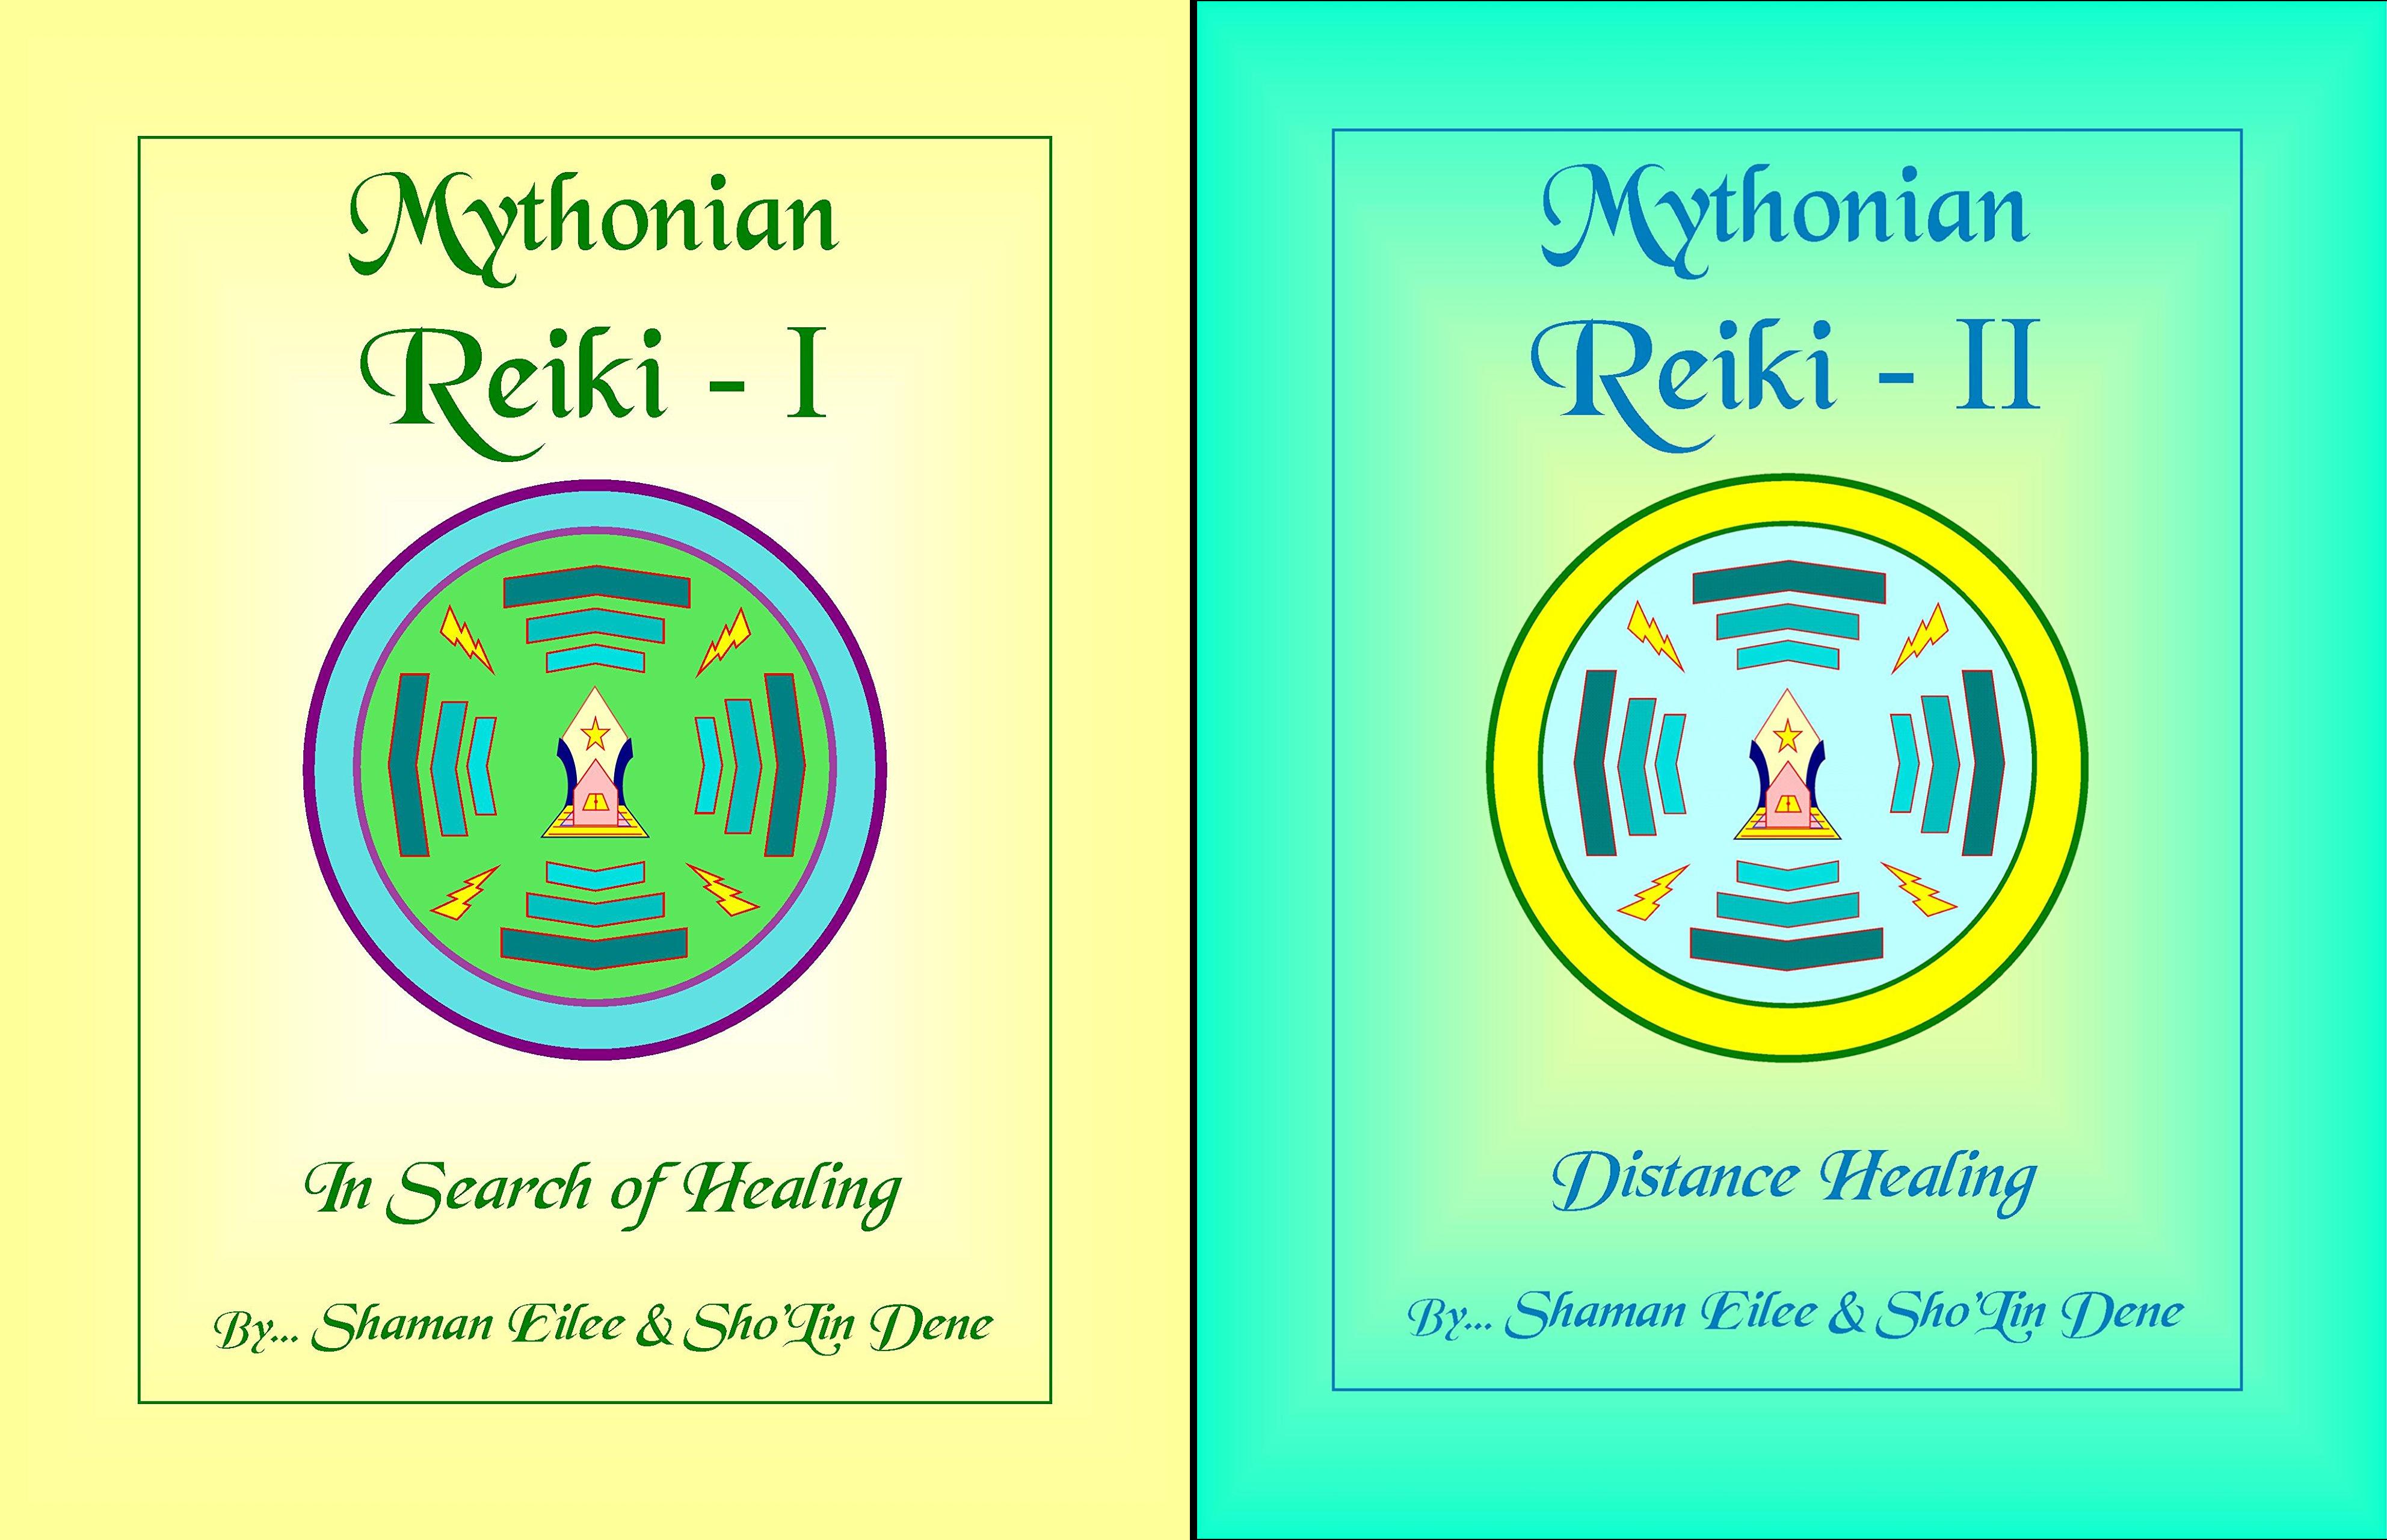 Mythonian Reiki Healing (2 Book Series)